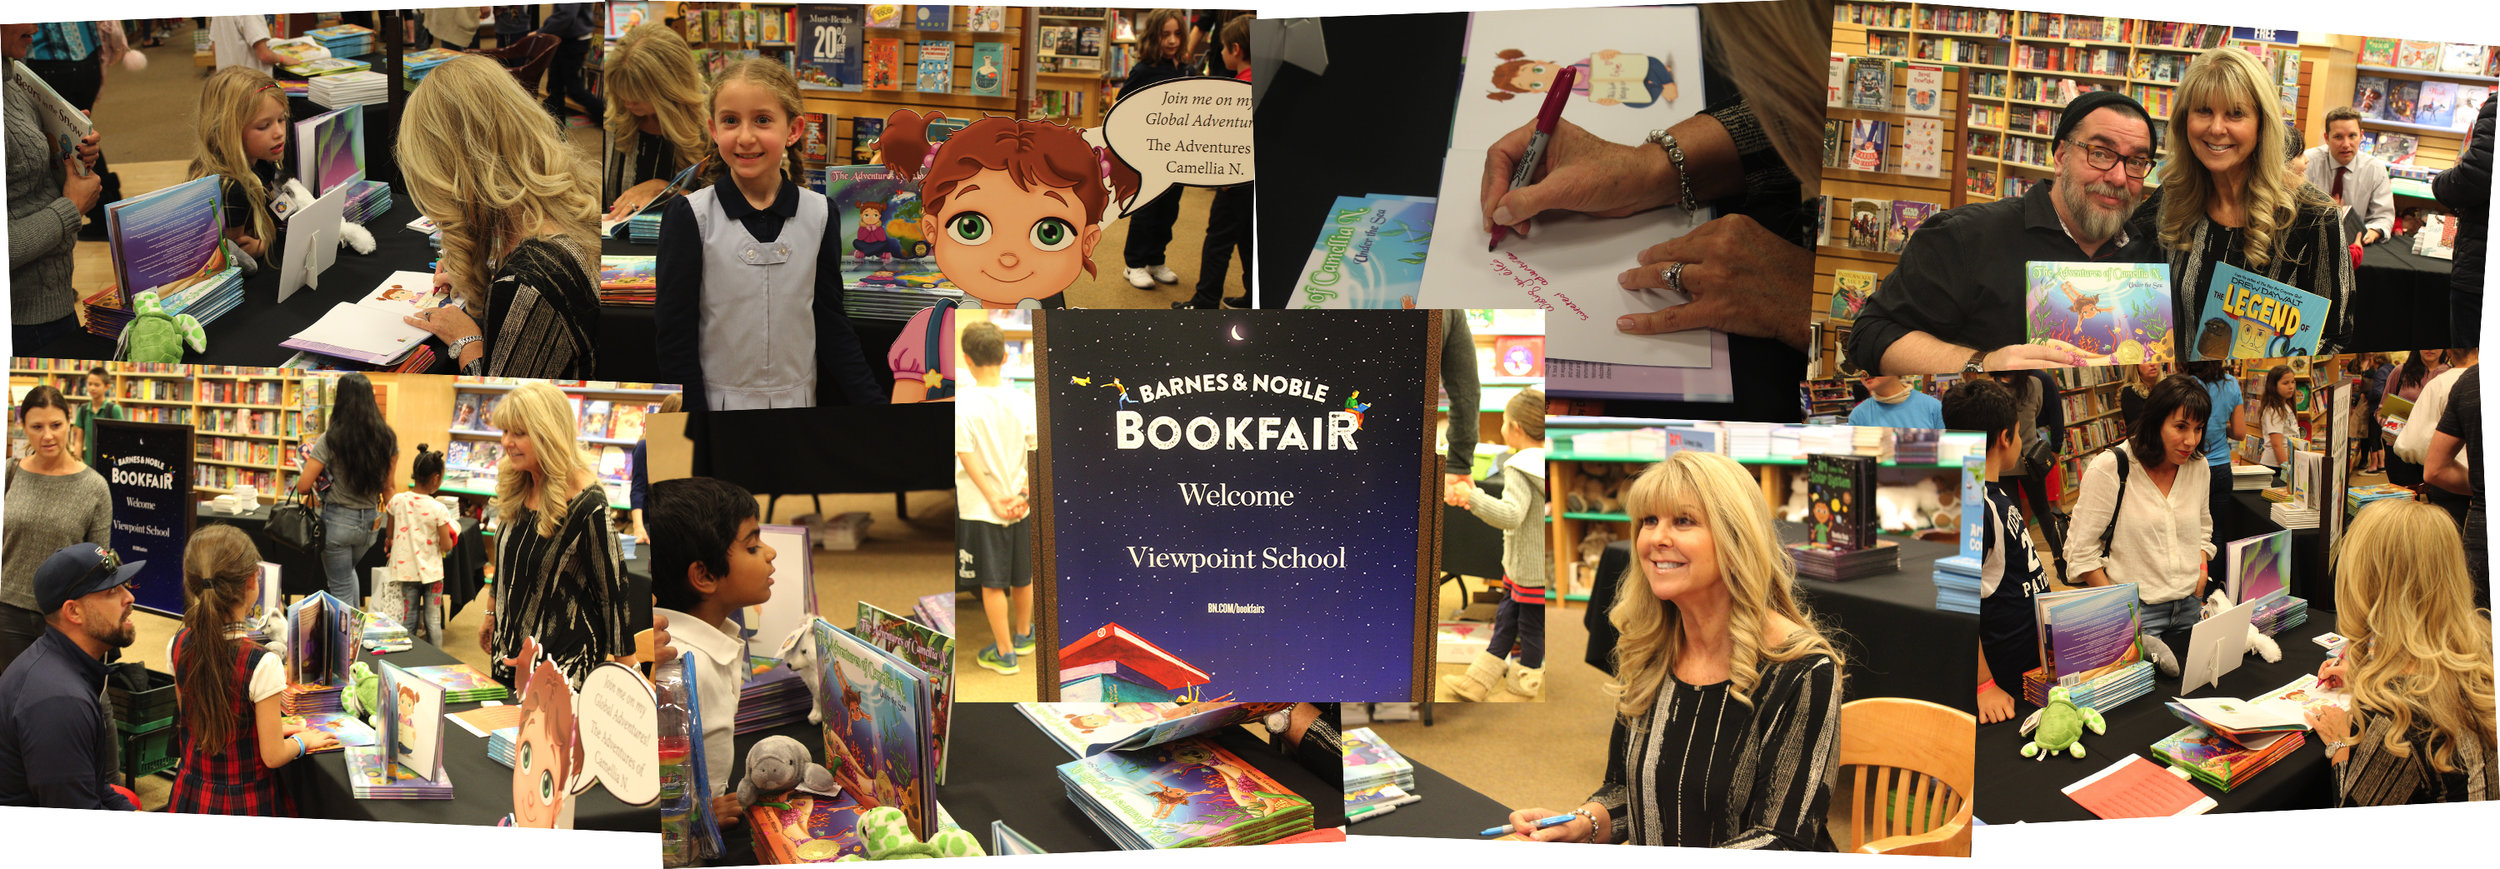 VSSA Winter BookFair Viewpoint School